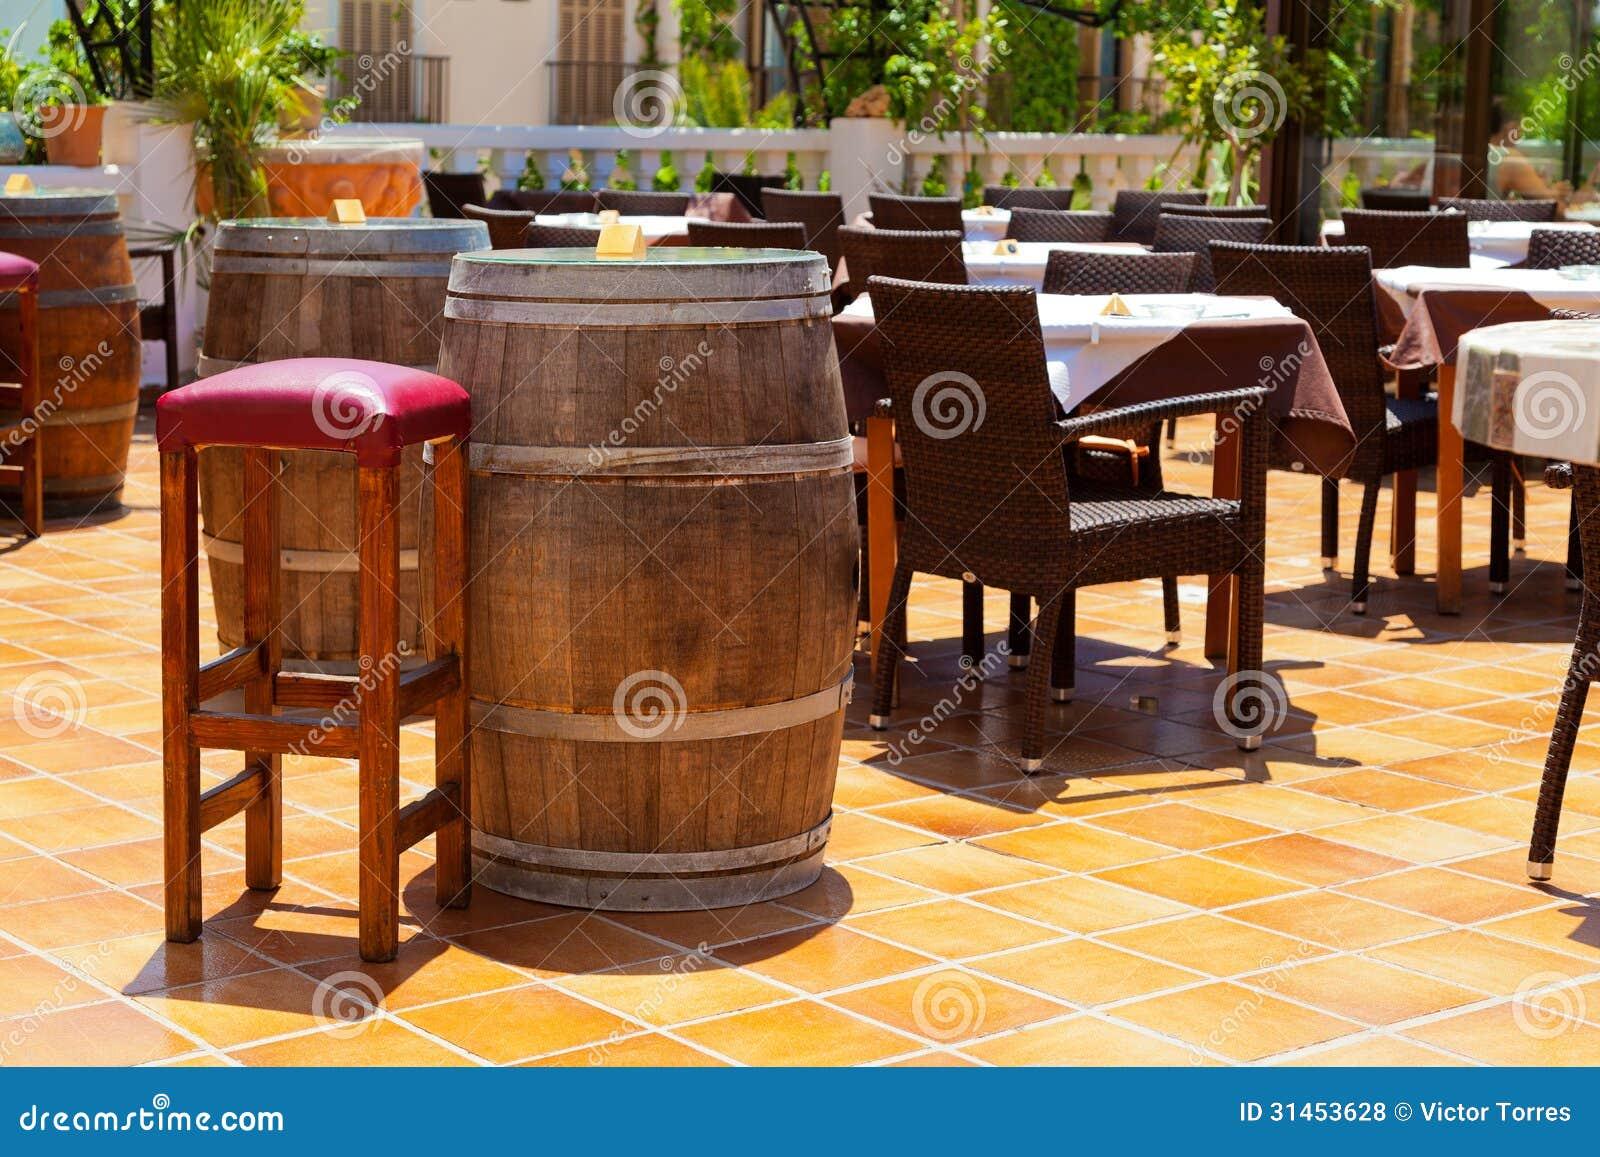 Espagnol Tapas Bar